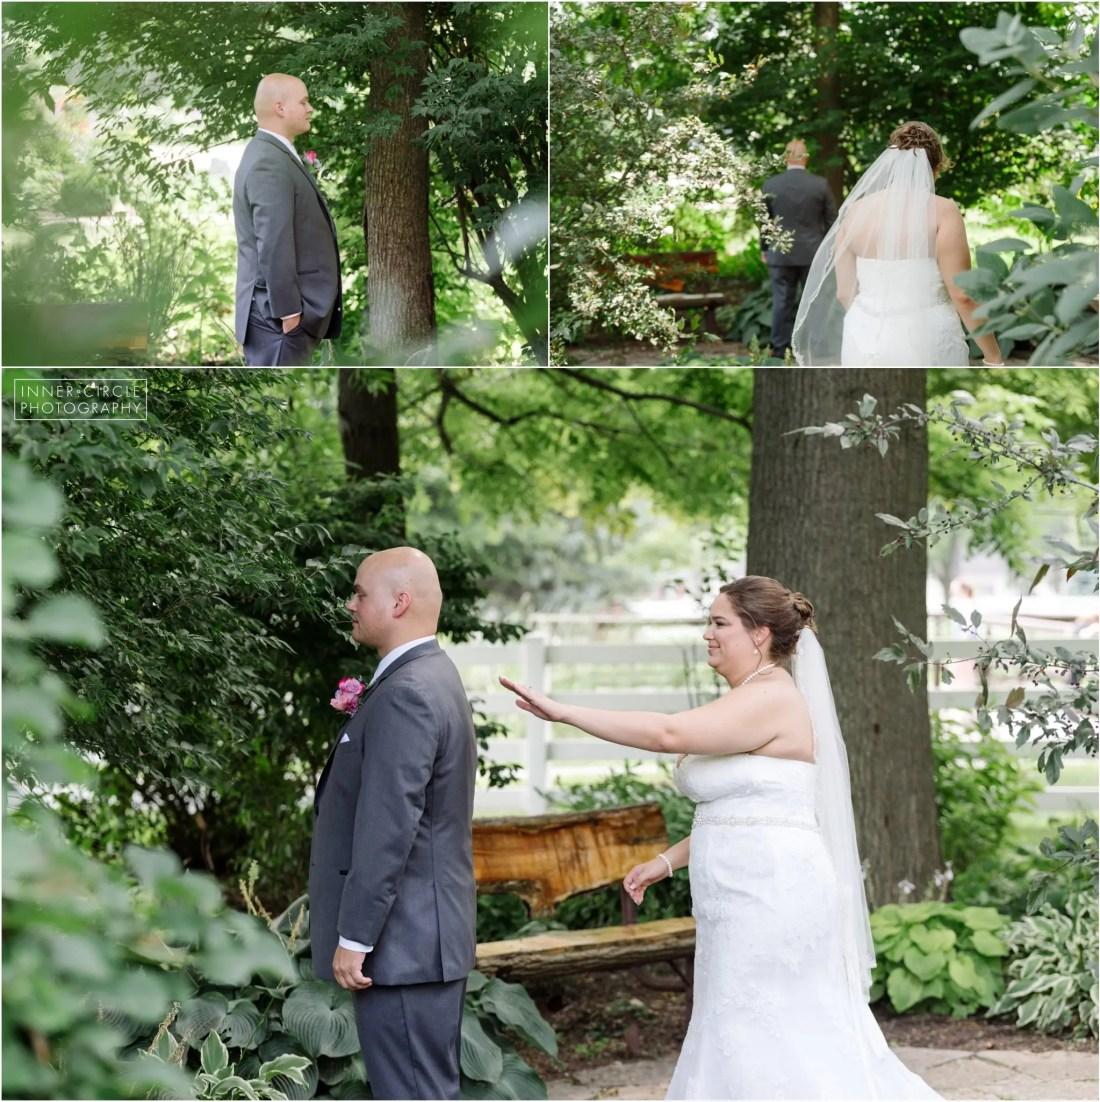 korbinashley_WED_InnerCirclePhoto_064 Korbin + Ashley :: MARRIED!